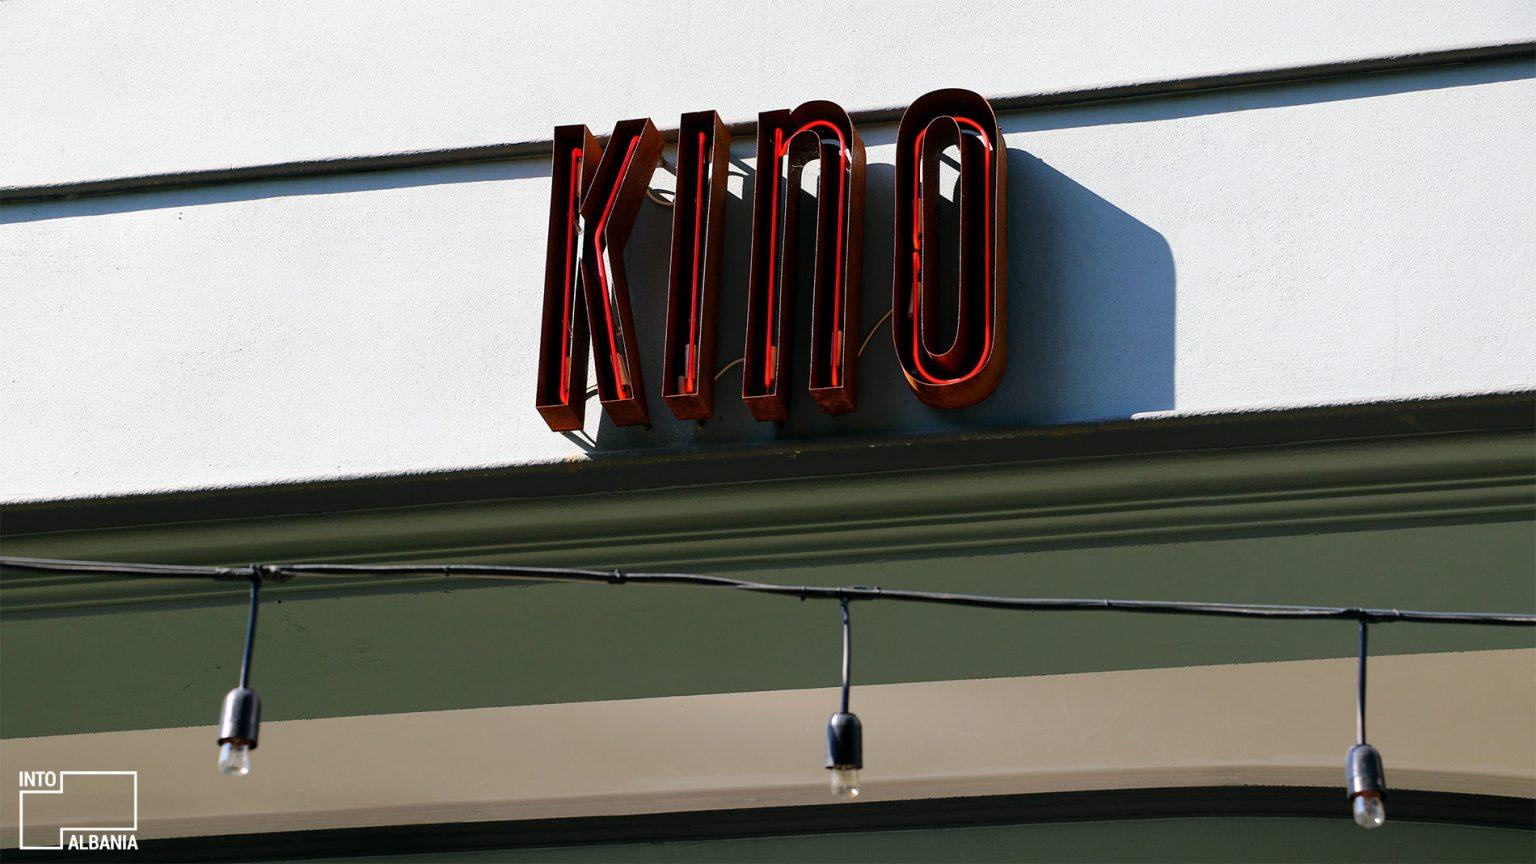 Kino bar entrance, photo by IntoAlbania.